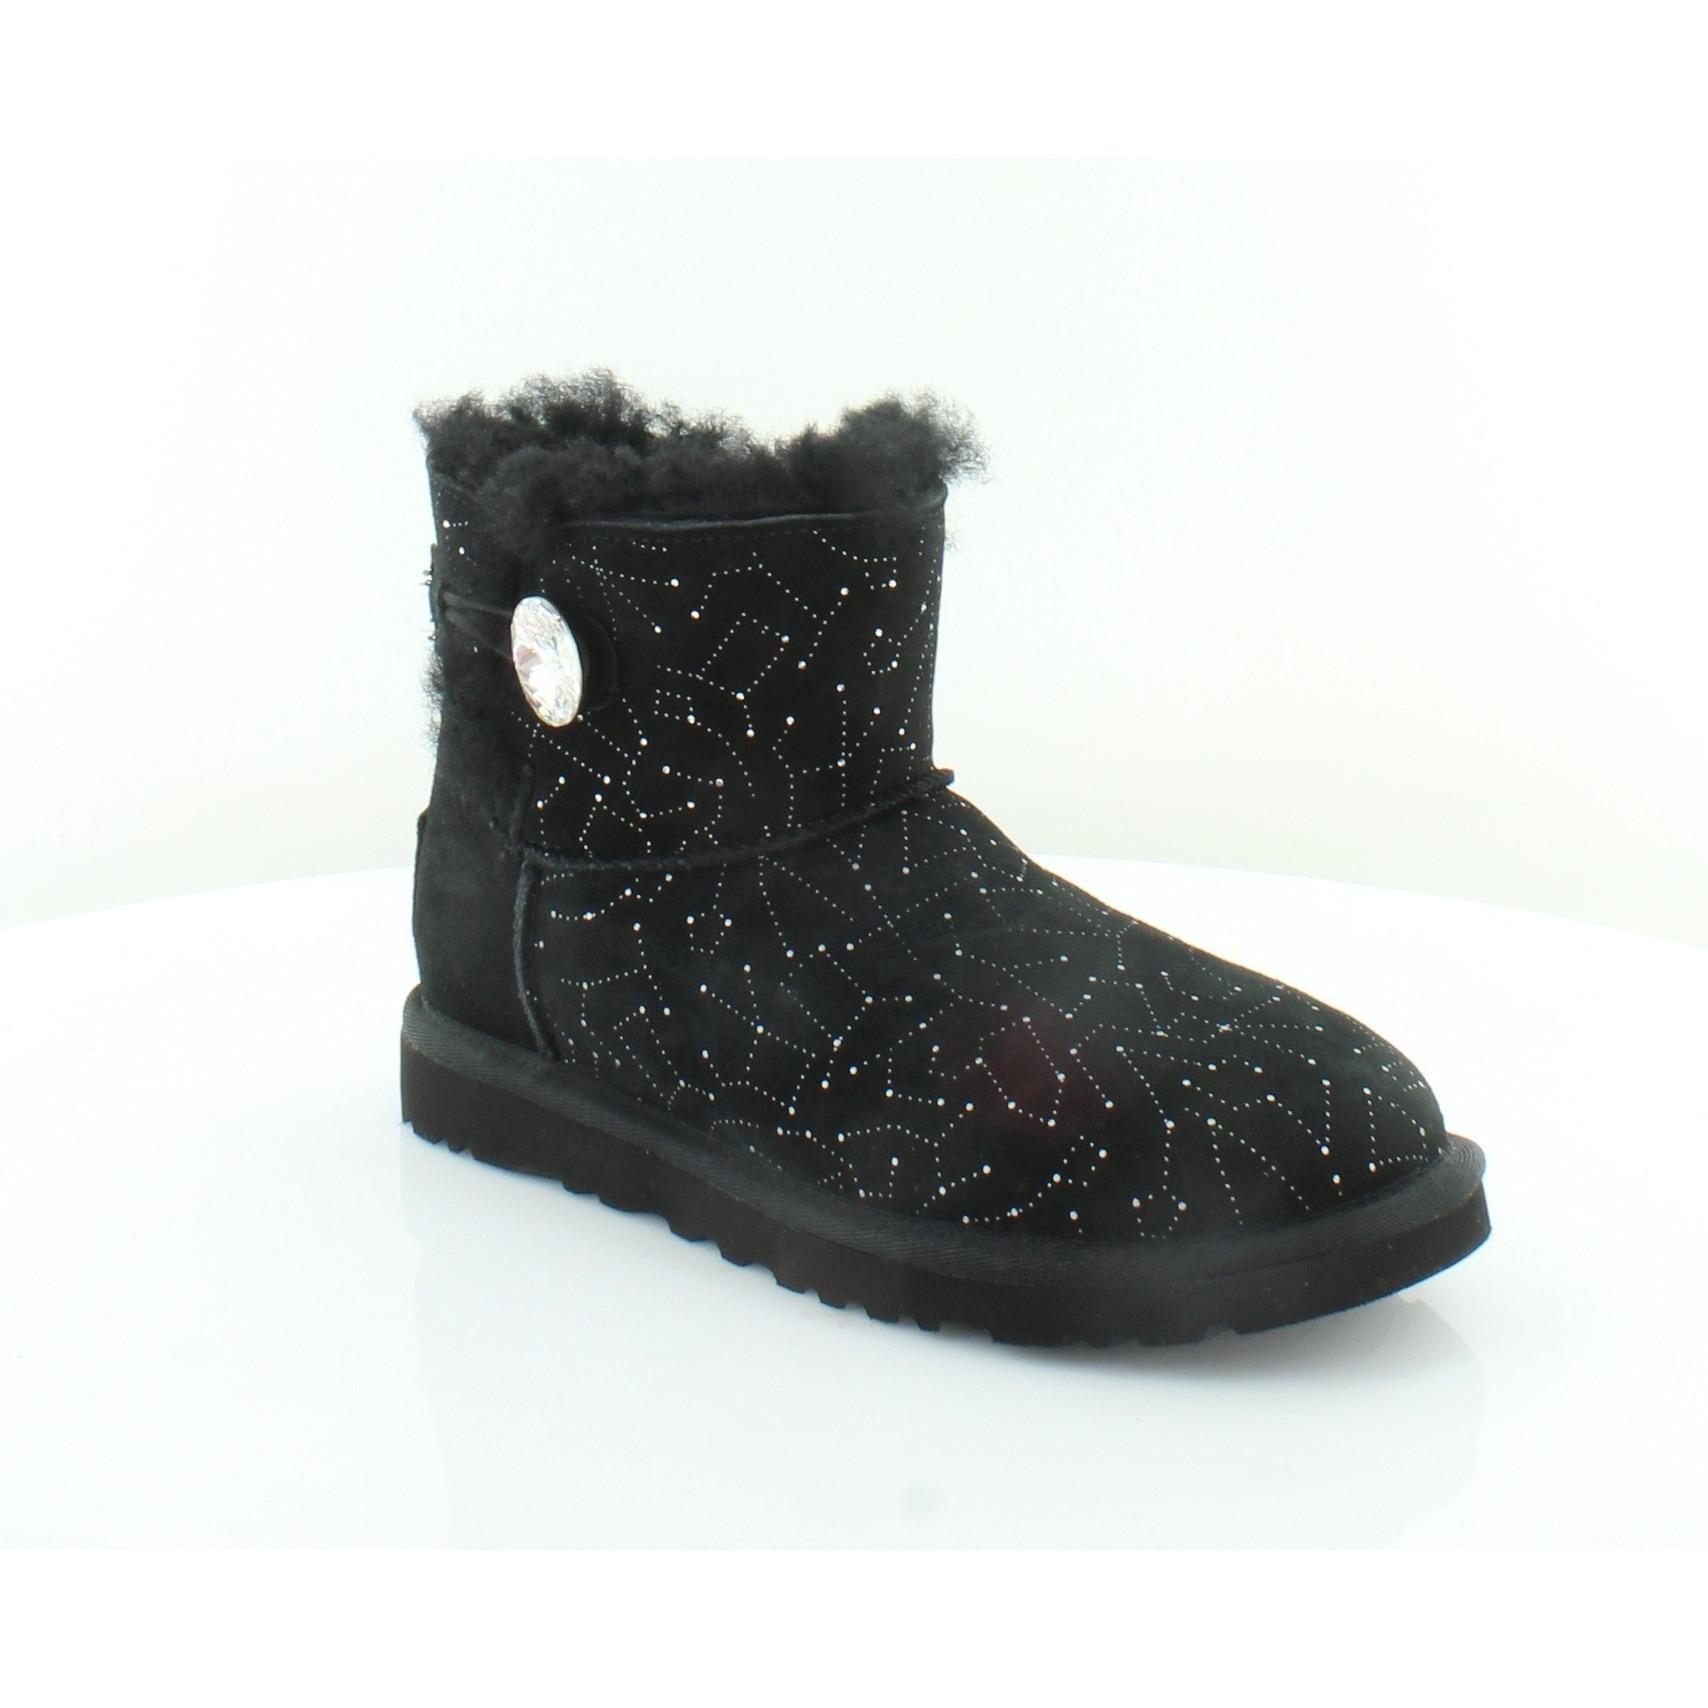 758daf25dbf ireland ugg mini bailey button bling constellation boot xp c29bc bd77f